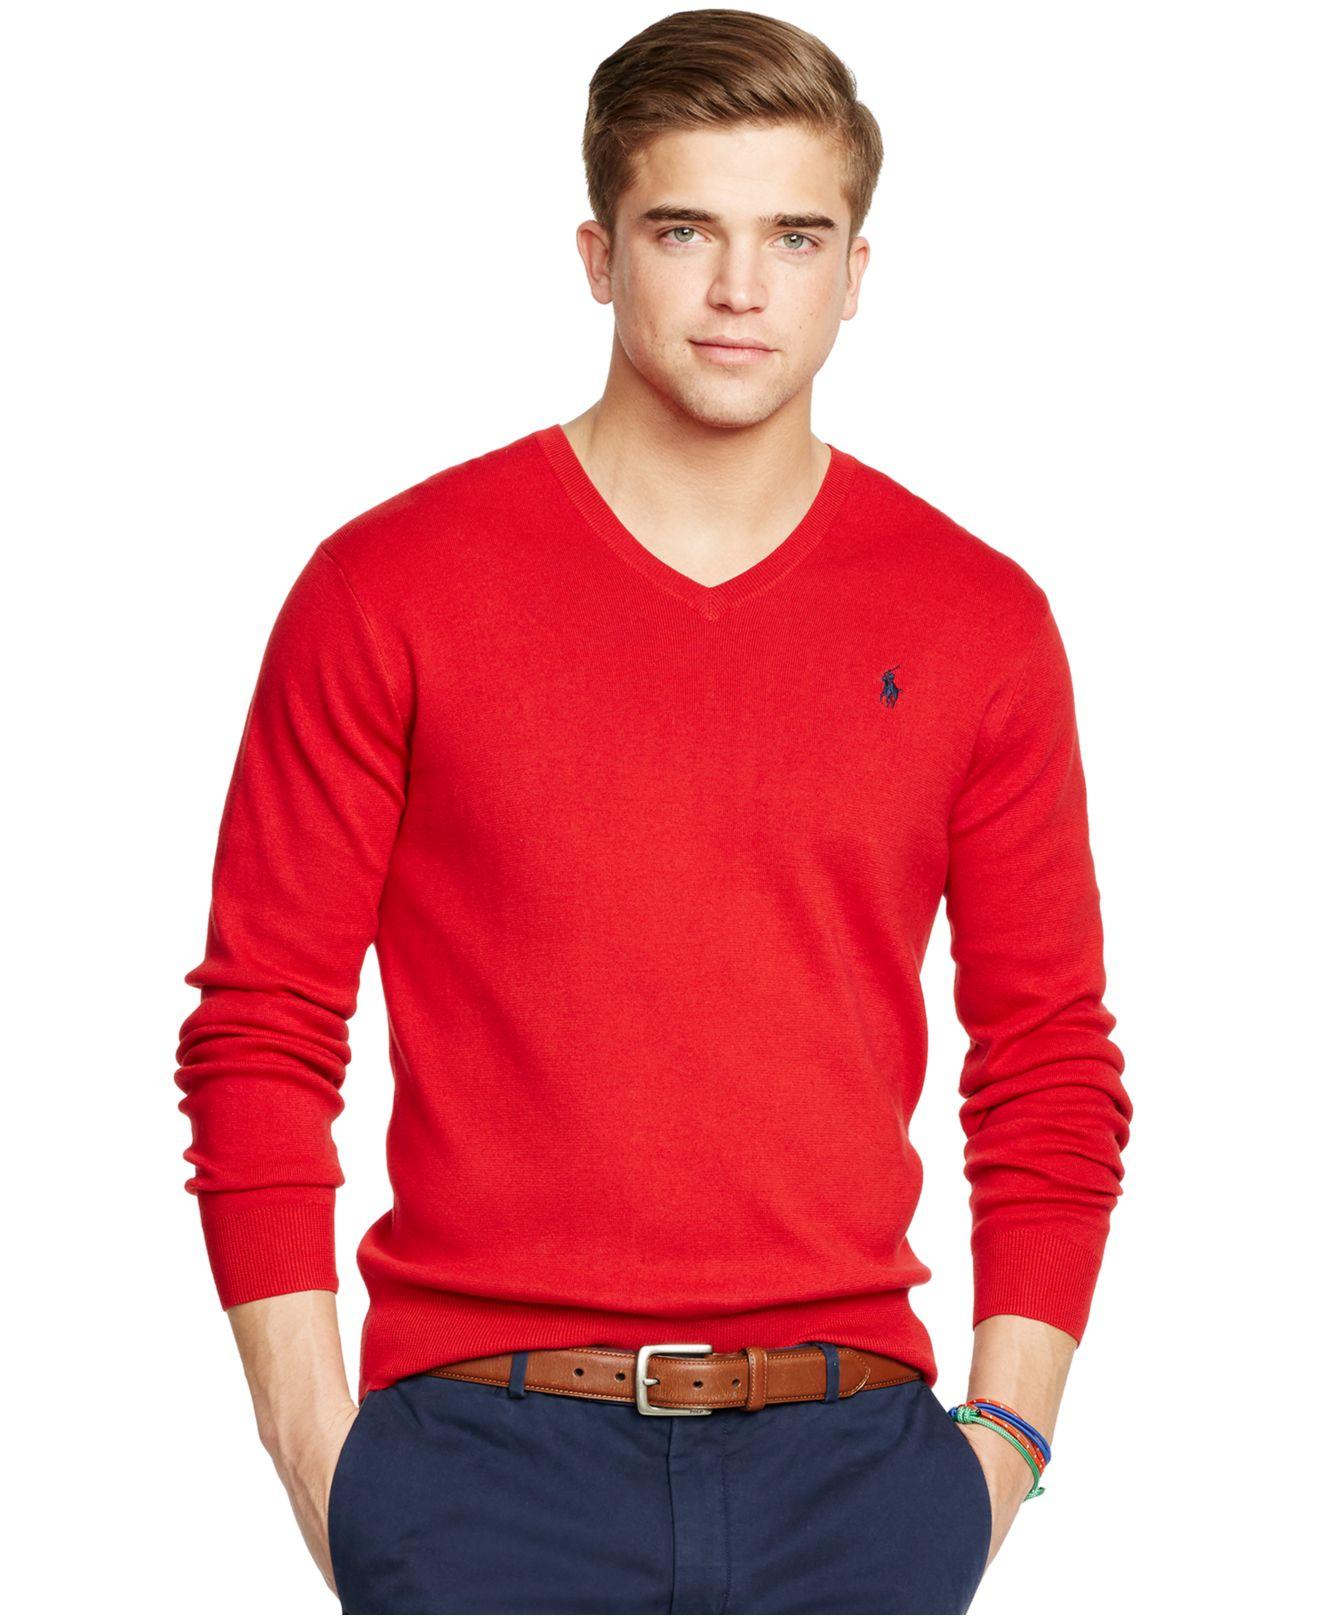 polo ralph lauren pima v neck sweater in red for men charter red lyst. Black Bedroom Furniture Sets. Home Design Ideas